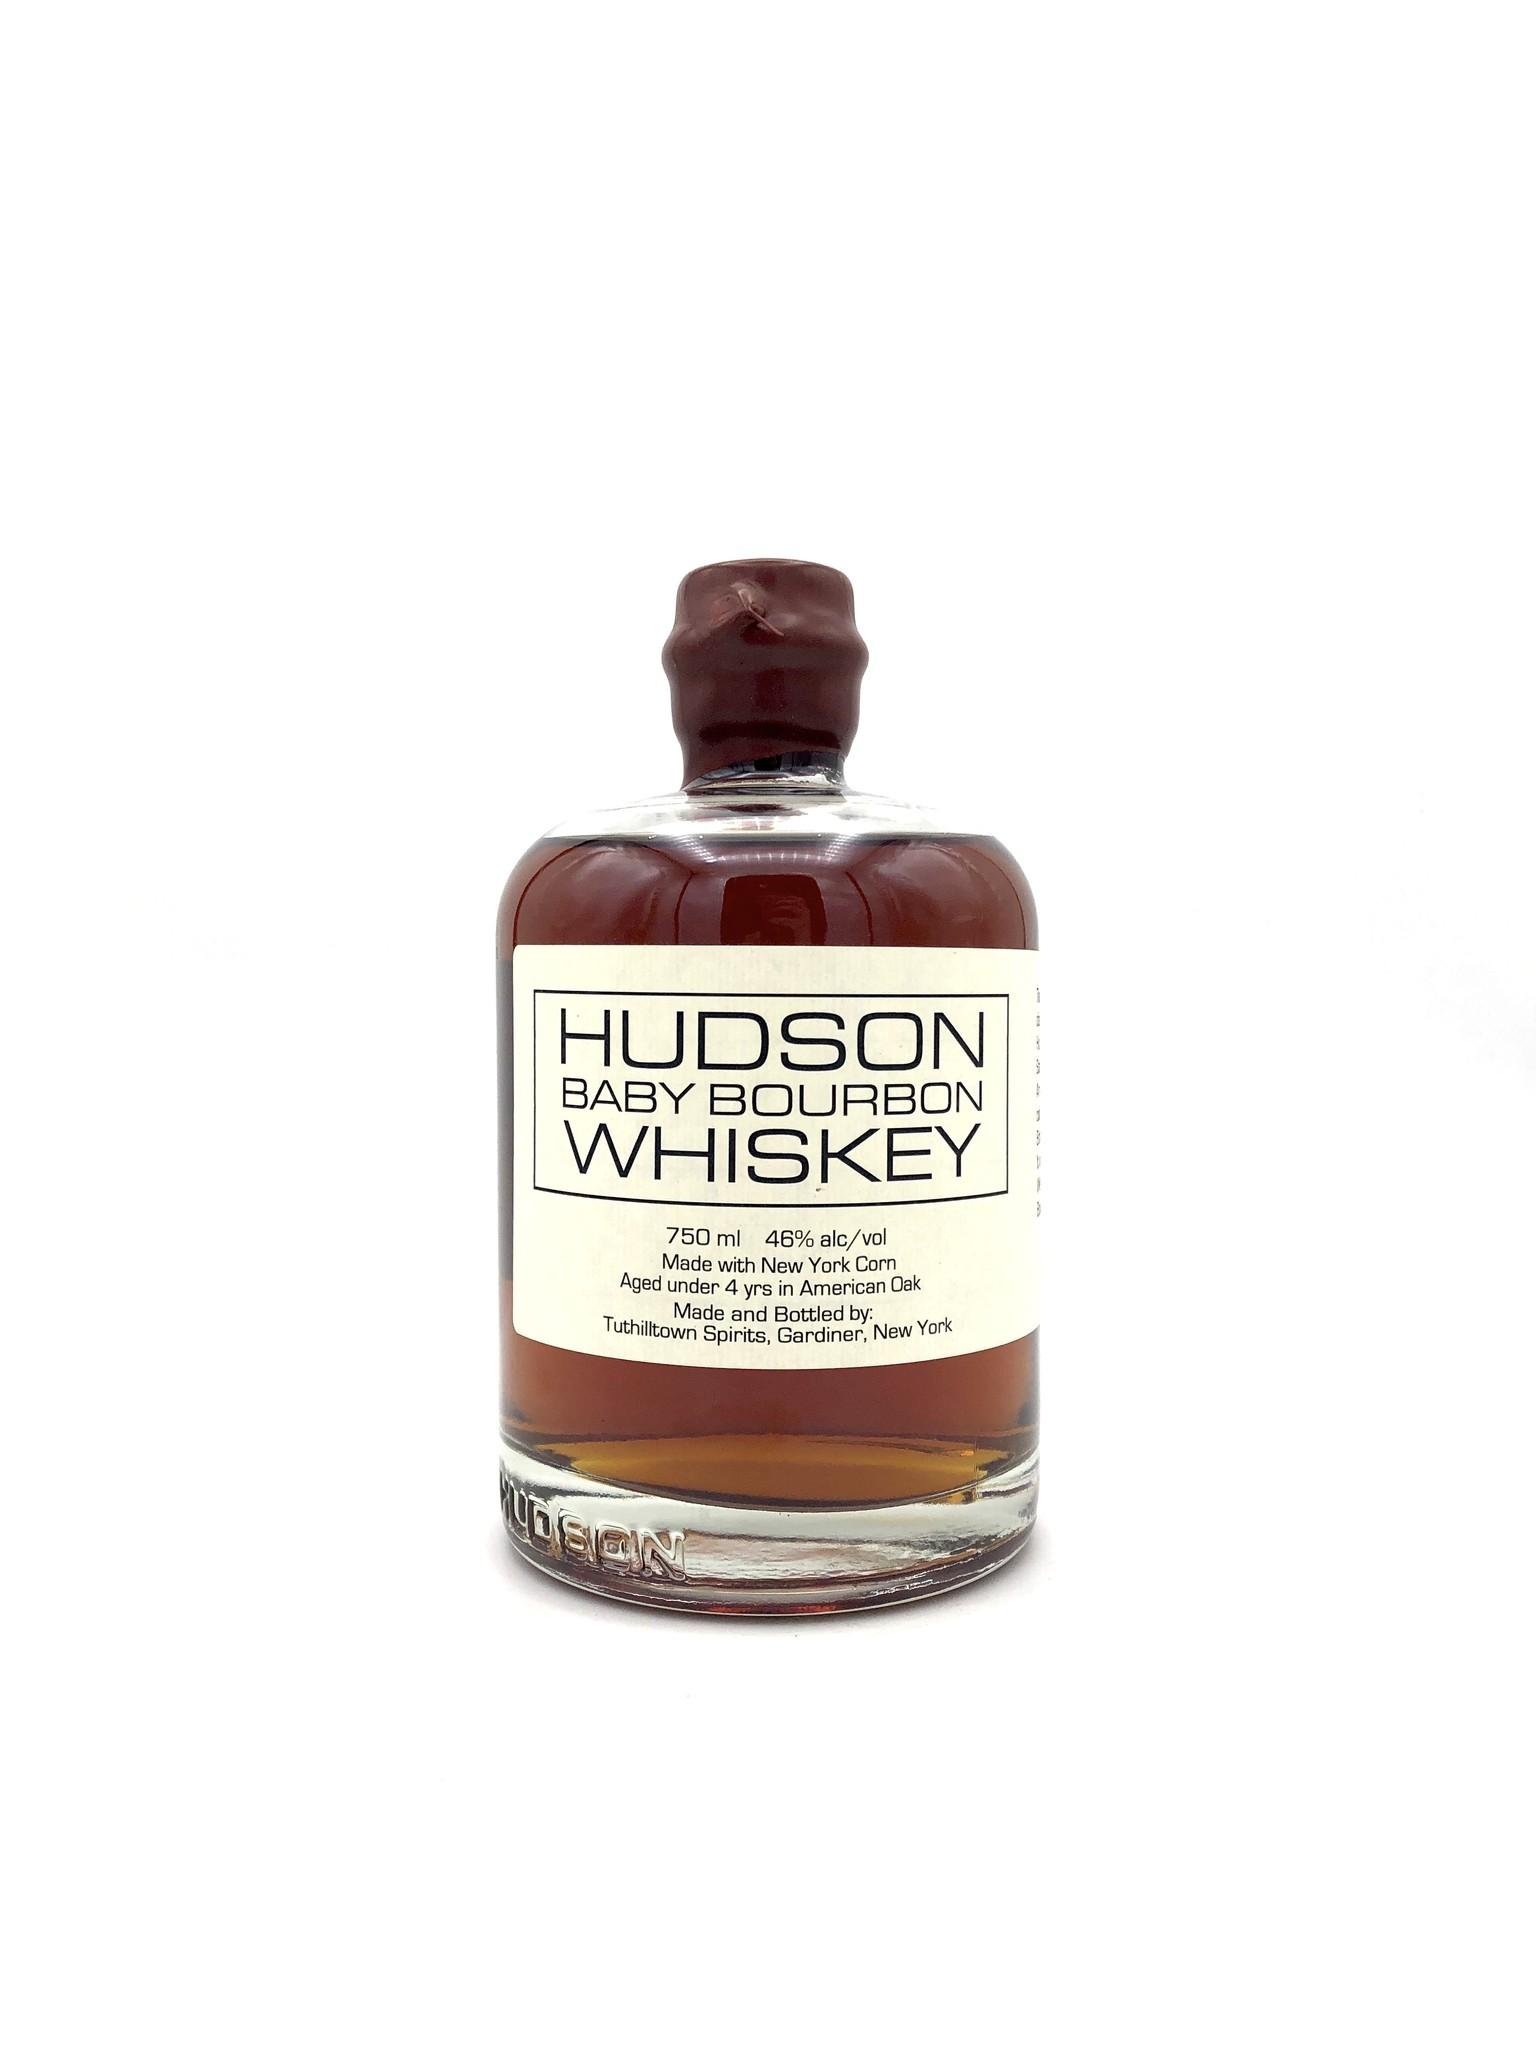 Baby Bourbon 750ml Hudson